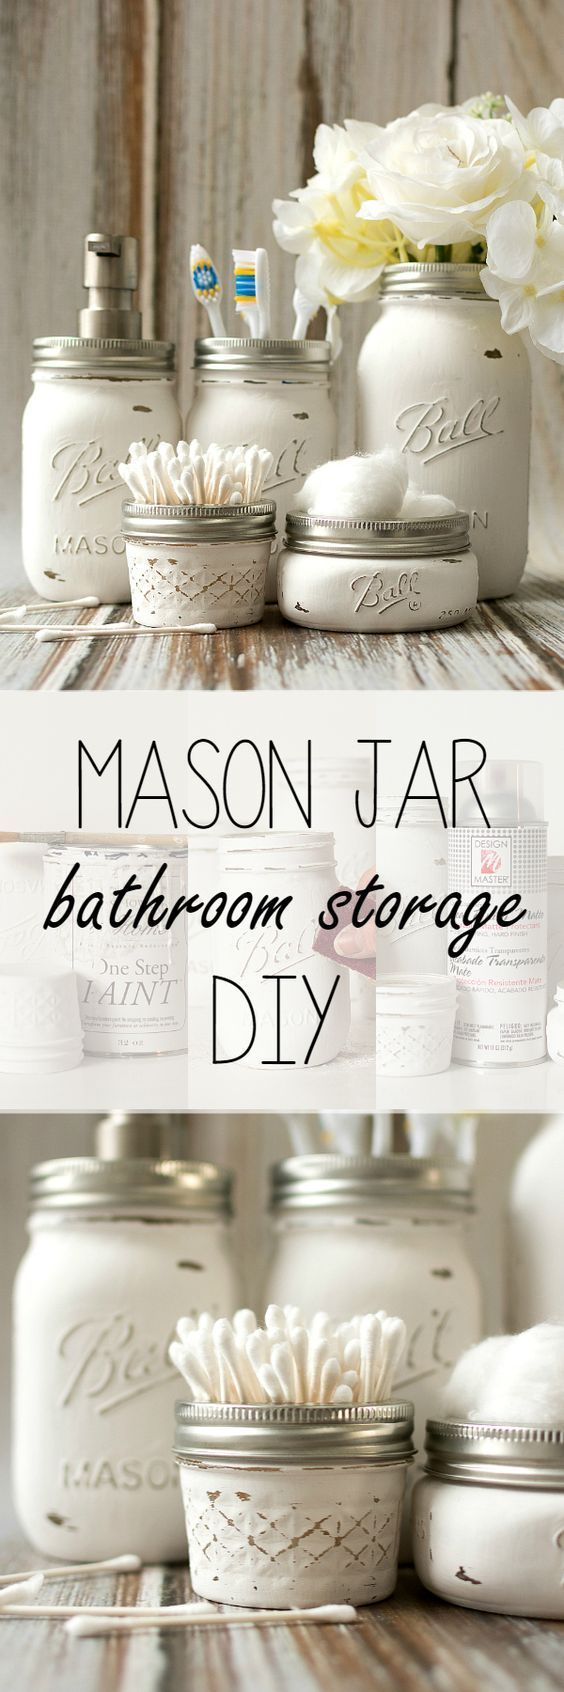 Mason Jar Bathroom Storage & Accessories - Mason Jar Crafts Love ...